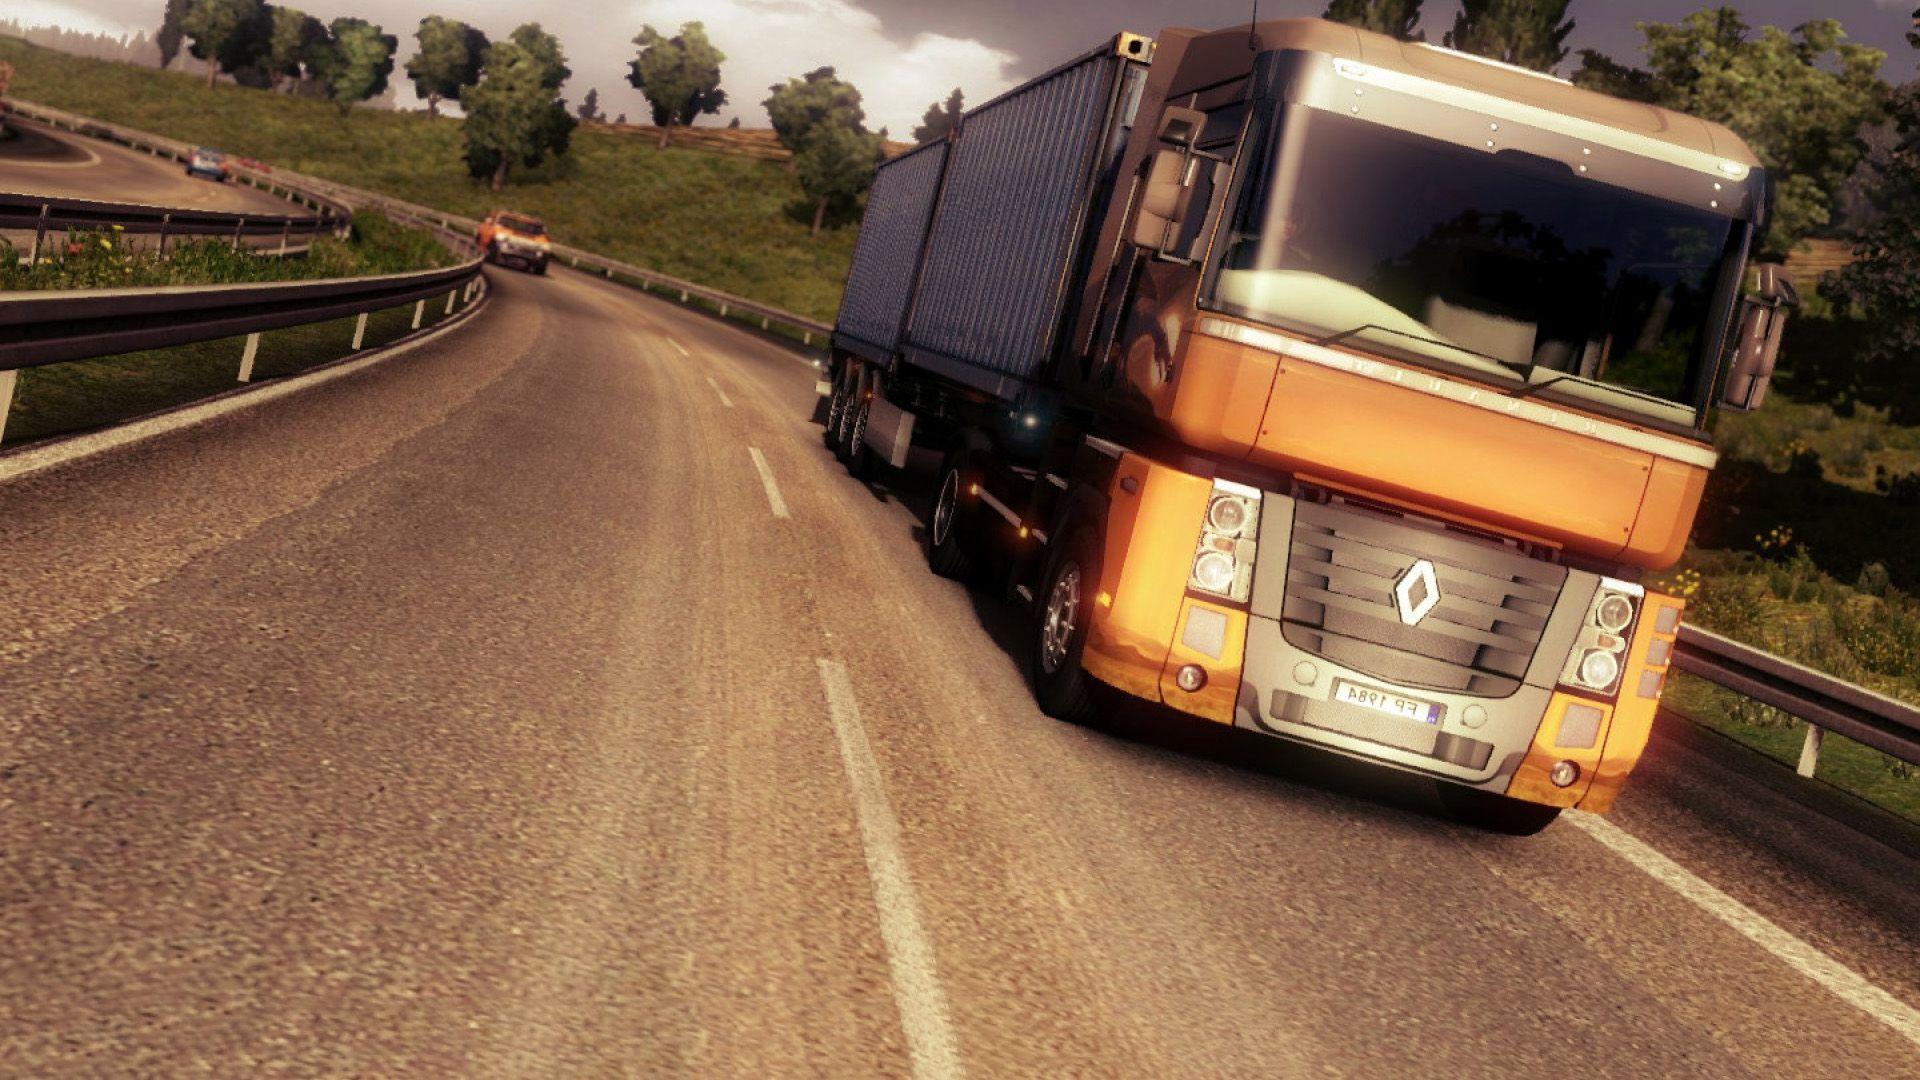 euro-truck-simulator-2-ets-2-vive-la-france-dlc-pc-steam-cd-key-satin-al-durmaplay.jpg